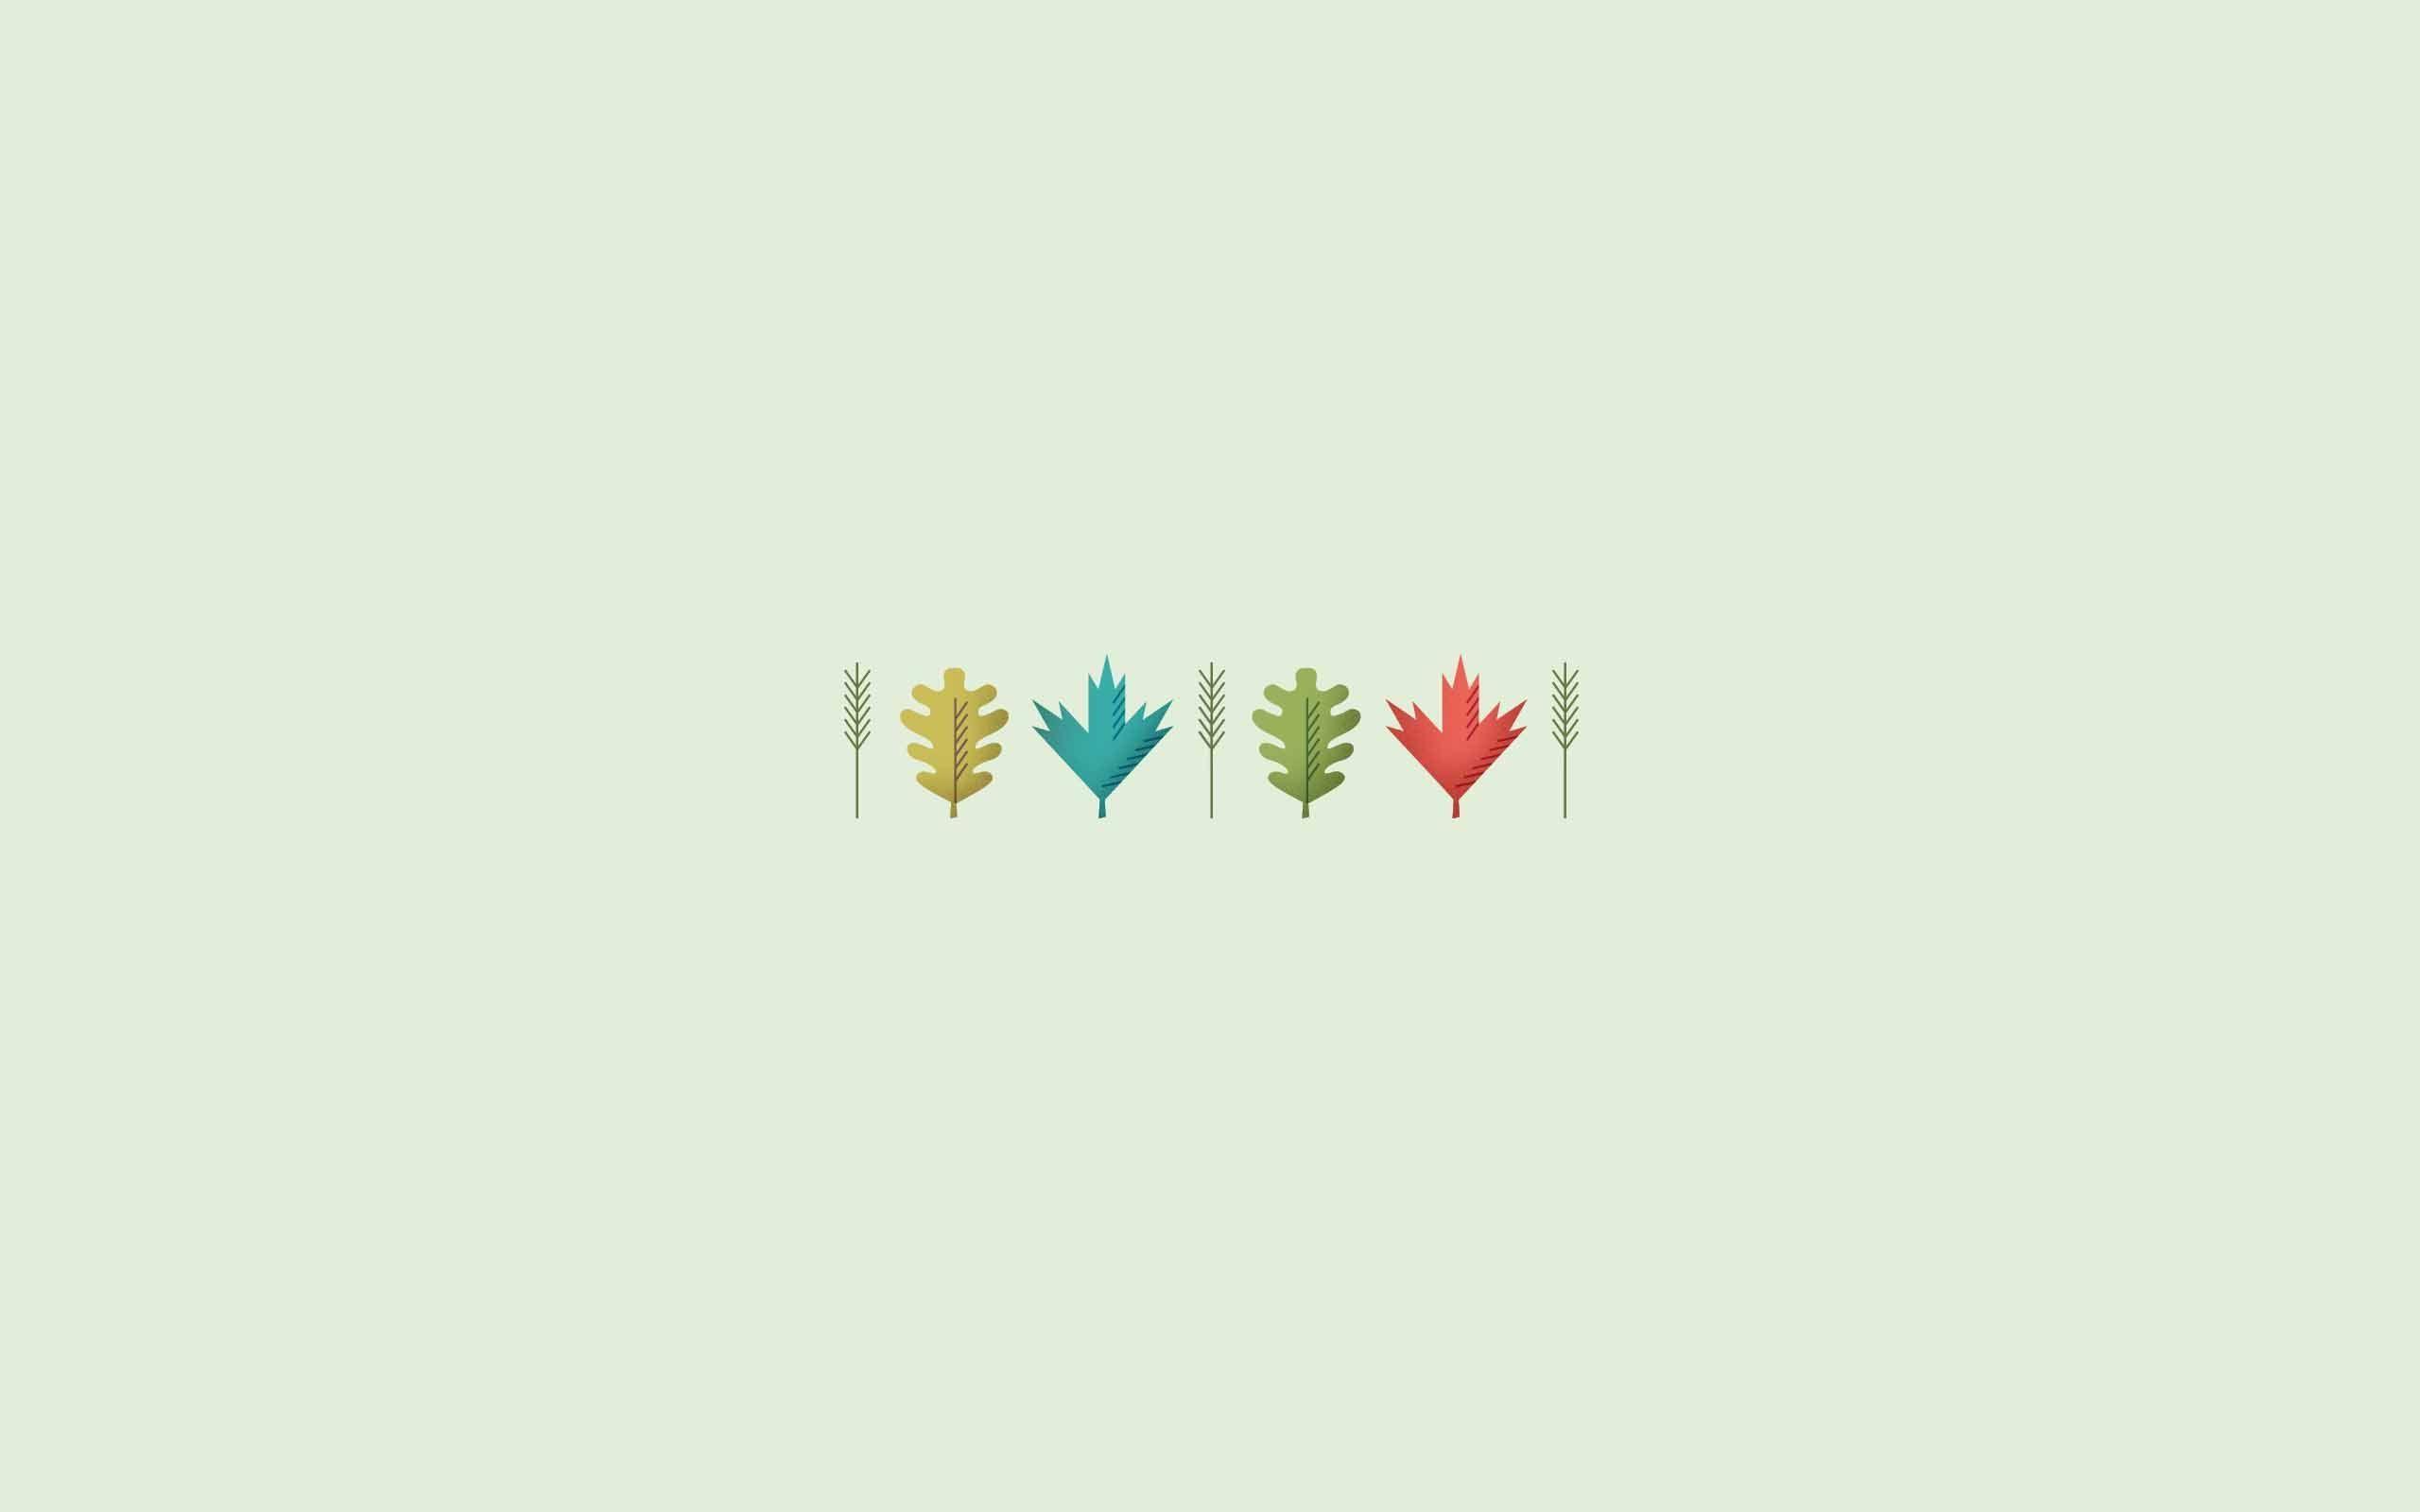 Fall Minimalist Wallpapers Top Free Fall Minimalist Backgrounds Wallpaperaccess